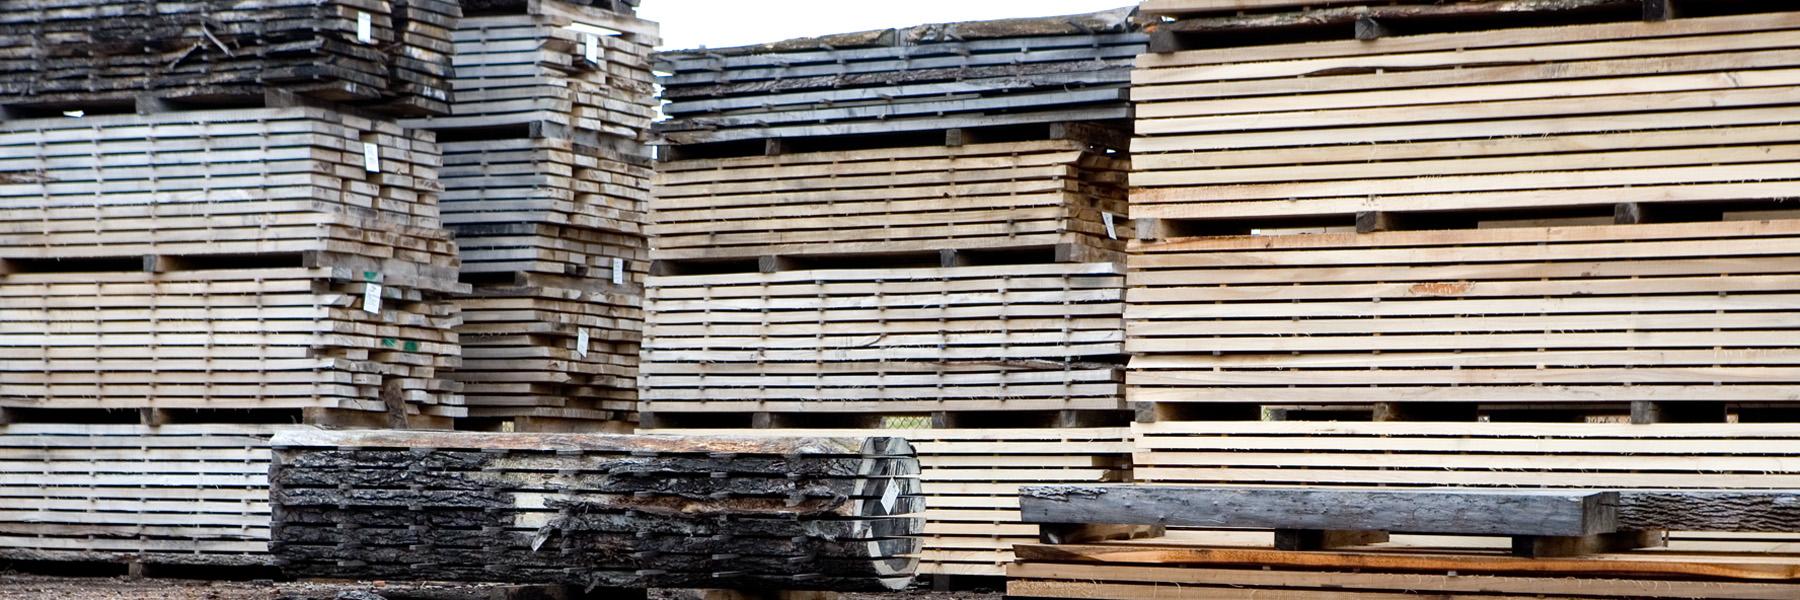 RapidScale Large Lumber Manufacturer Case Study